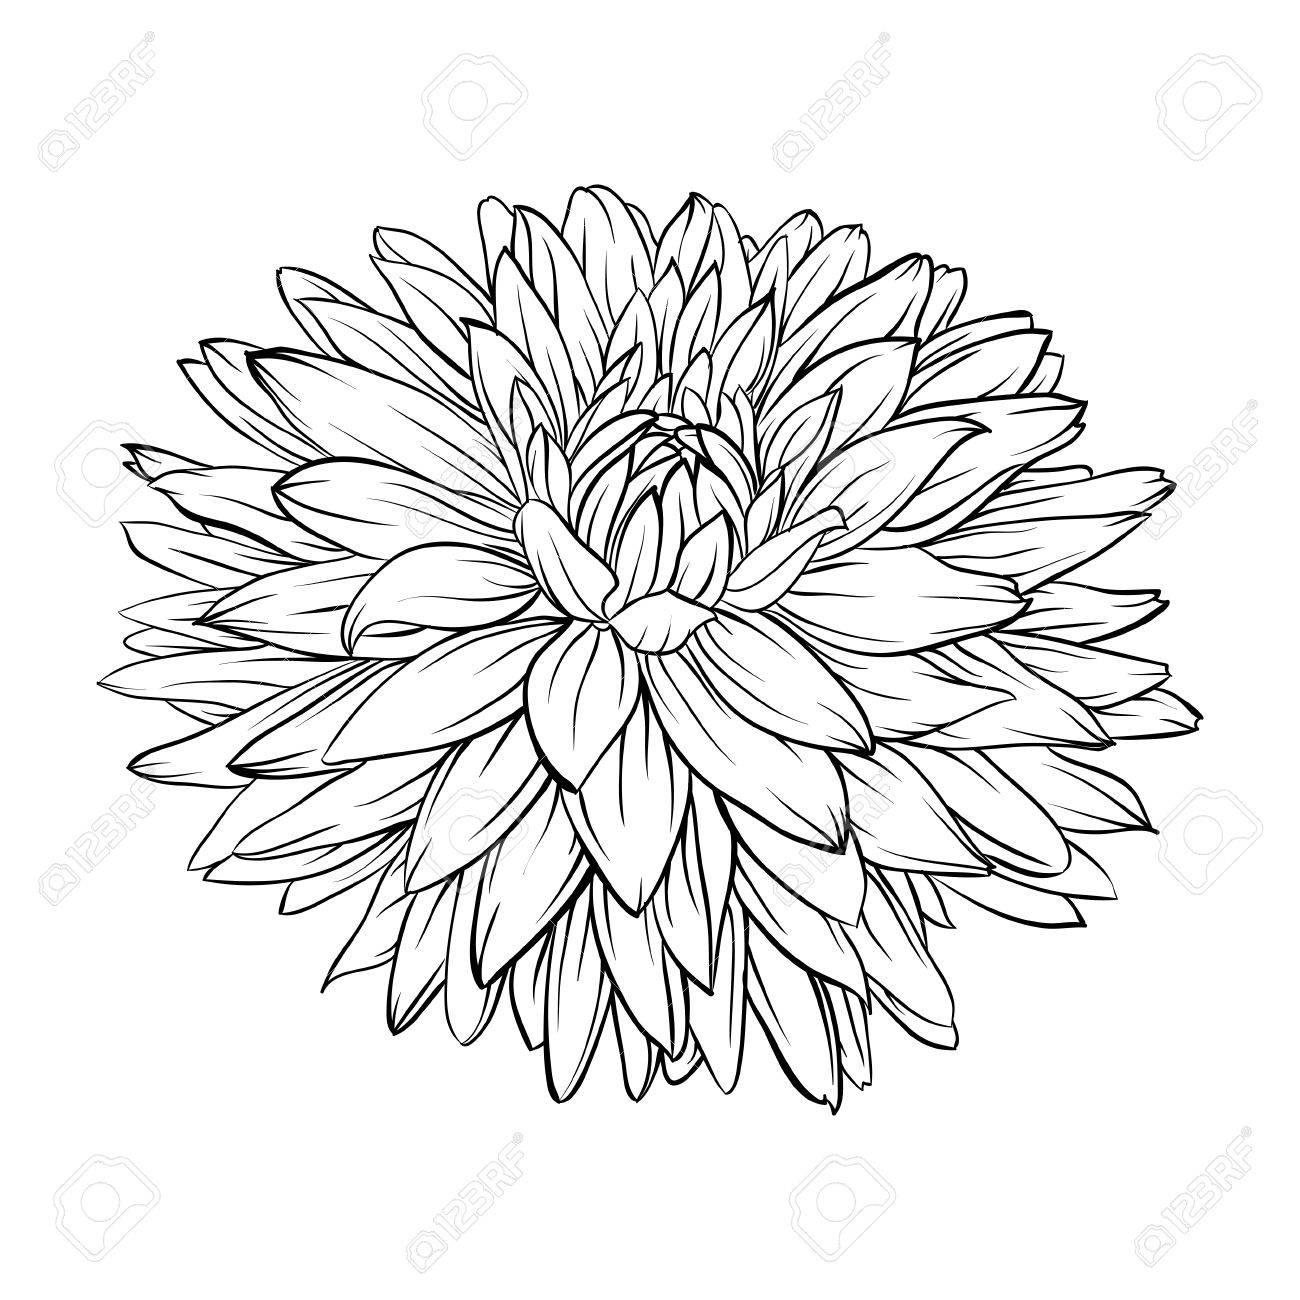 1300x1300 Beautiful Monochrome, Black And White Dahlia Flower Isolated